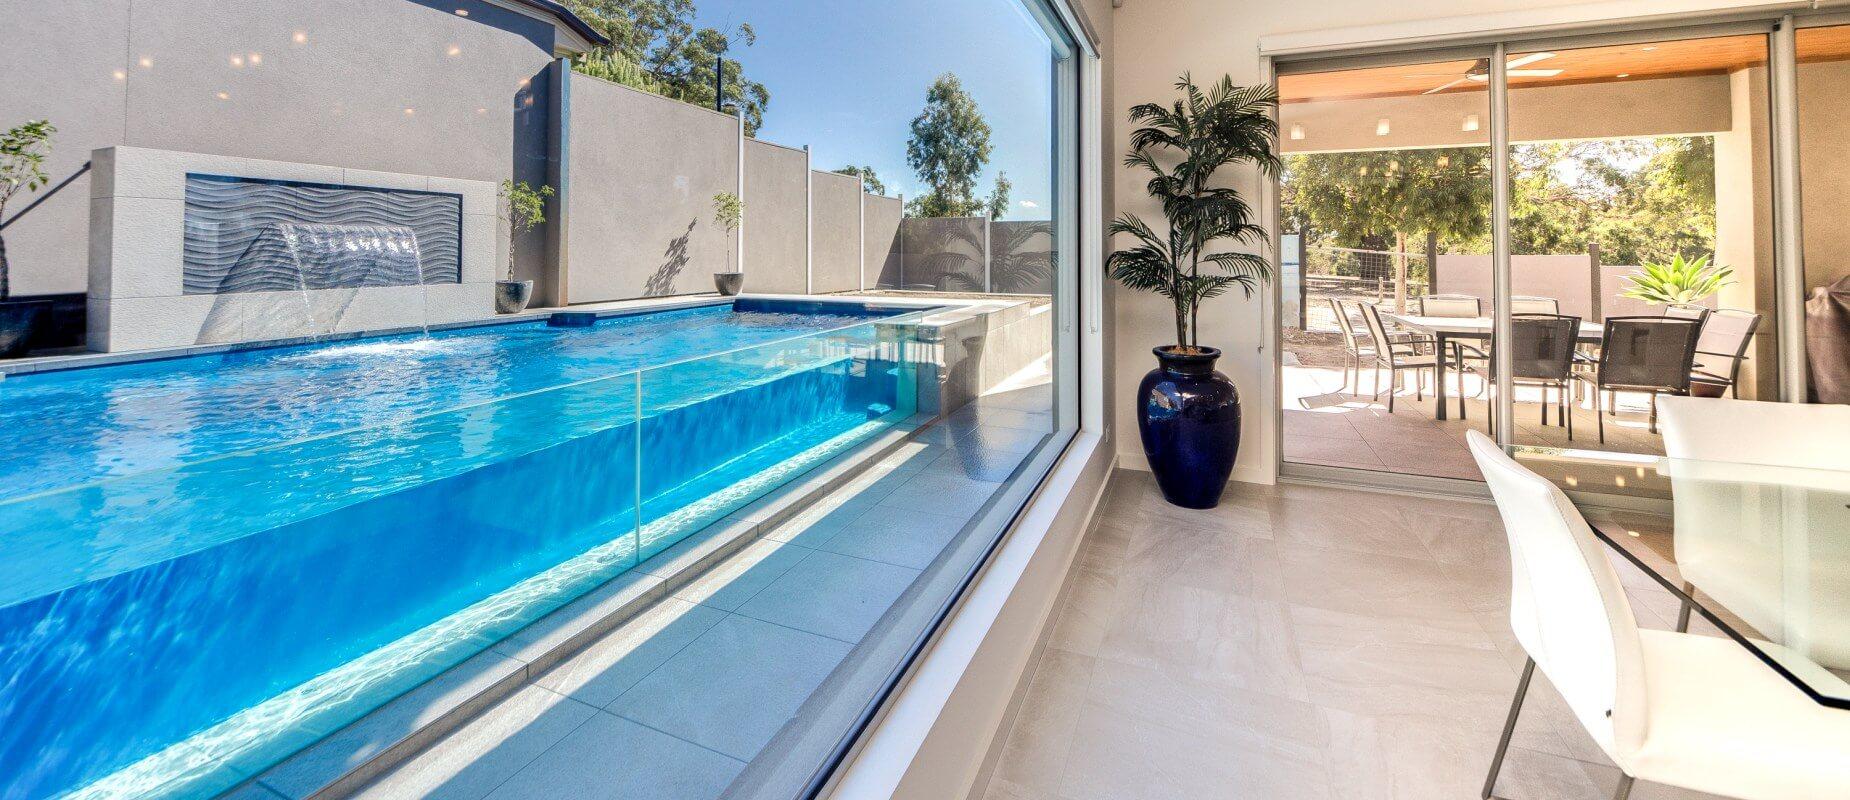 piscina de lux modele frumoase 37